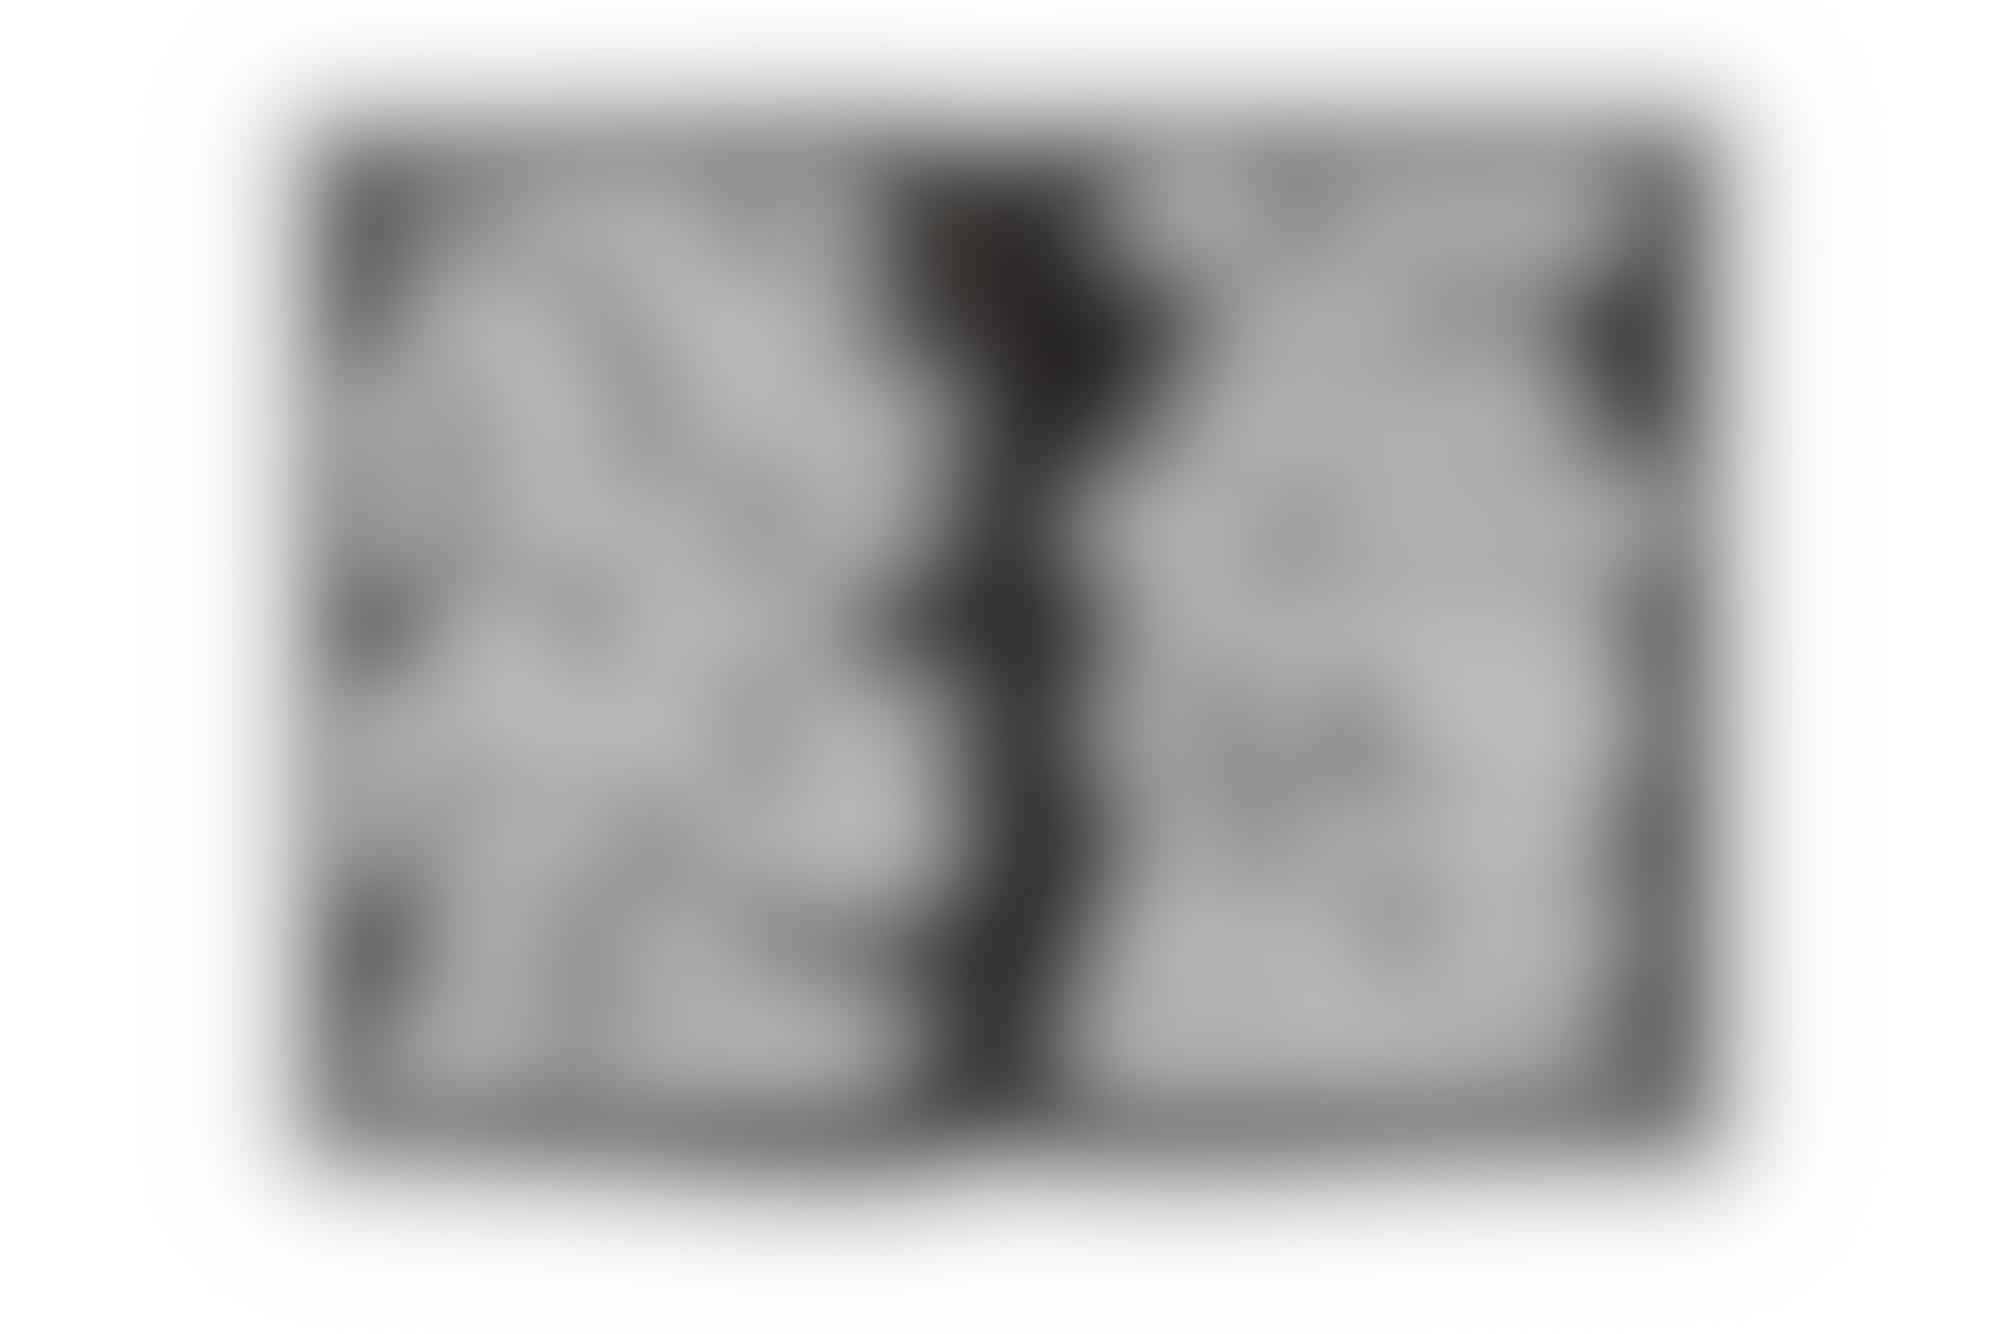 Rough Trade Blank Issue5 8 autocompressfitresizeixlibphp 1 1 0max h2000max w3 D2000q80s83a1f73366869ebb4347ddc10a7e8683